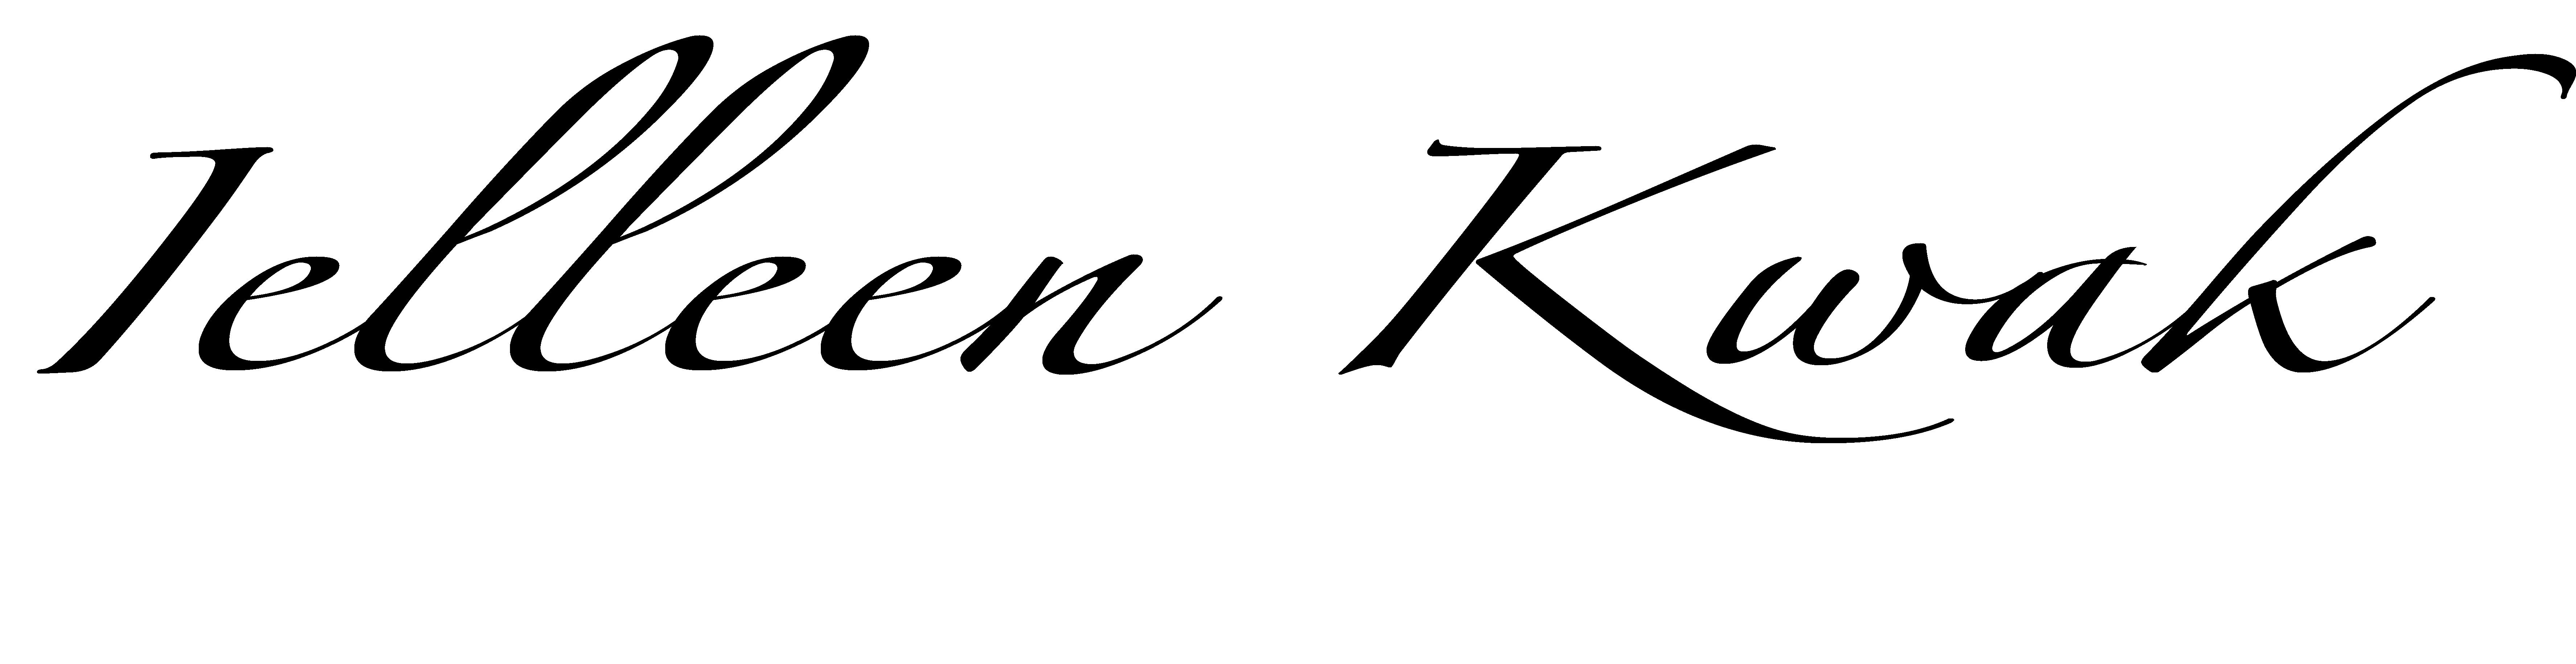 ielleen kwak's Signature